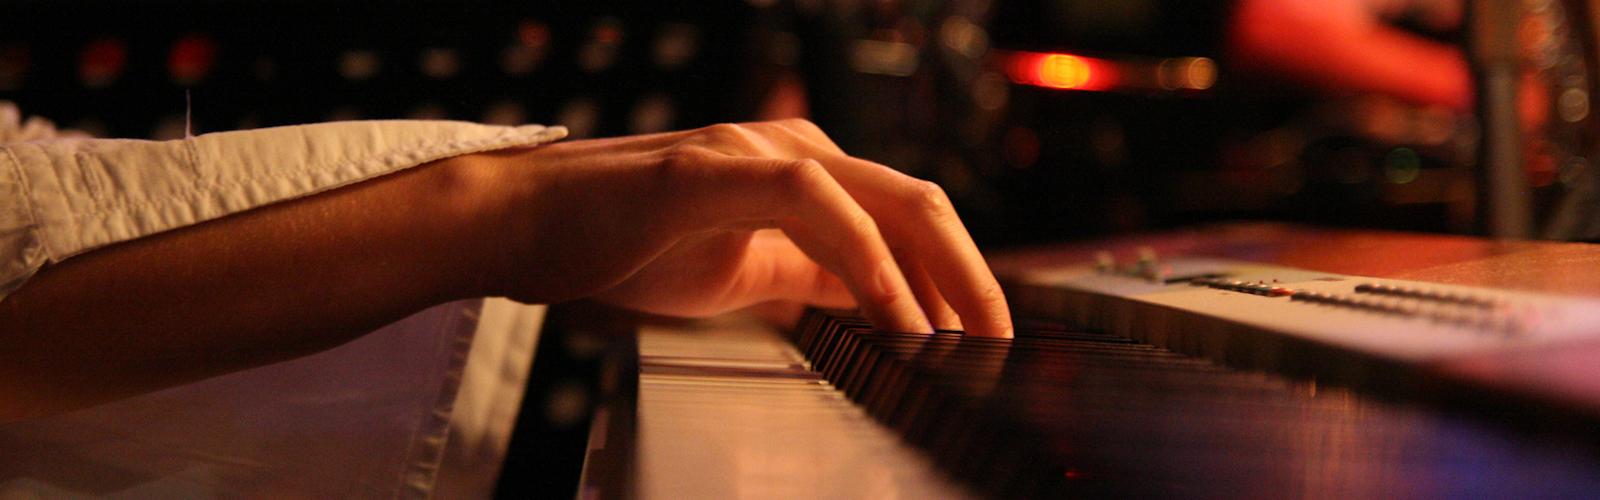 Die Hand am Klavier